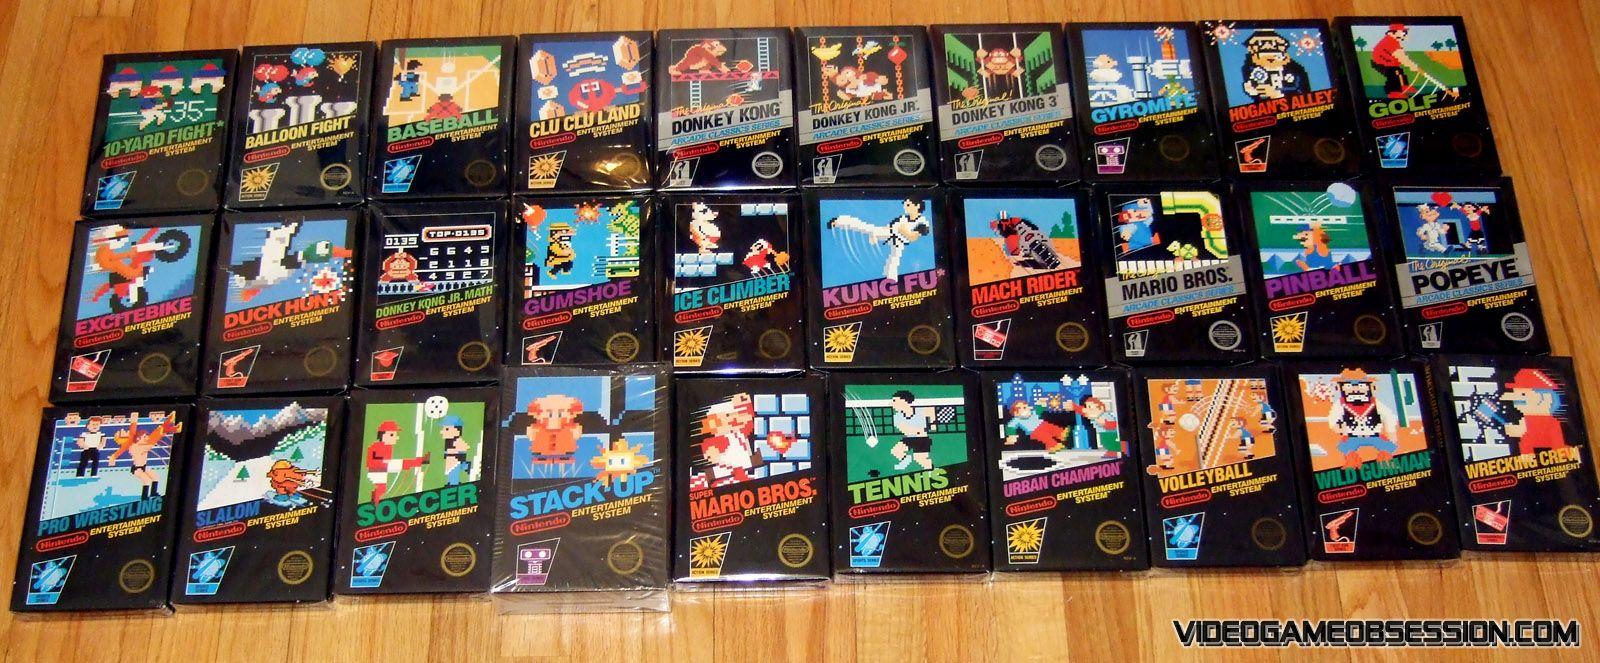 All NES Black Box games Nes games, Black box game, Game